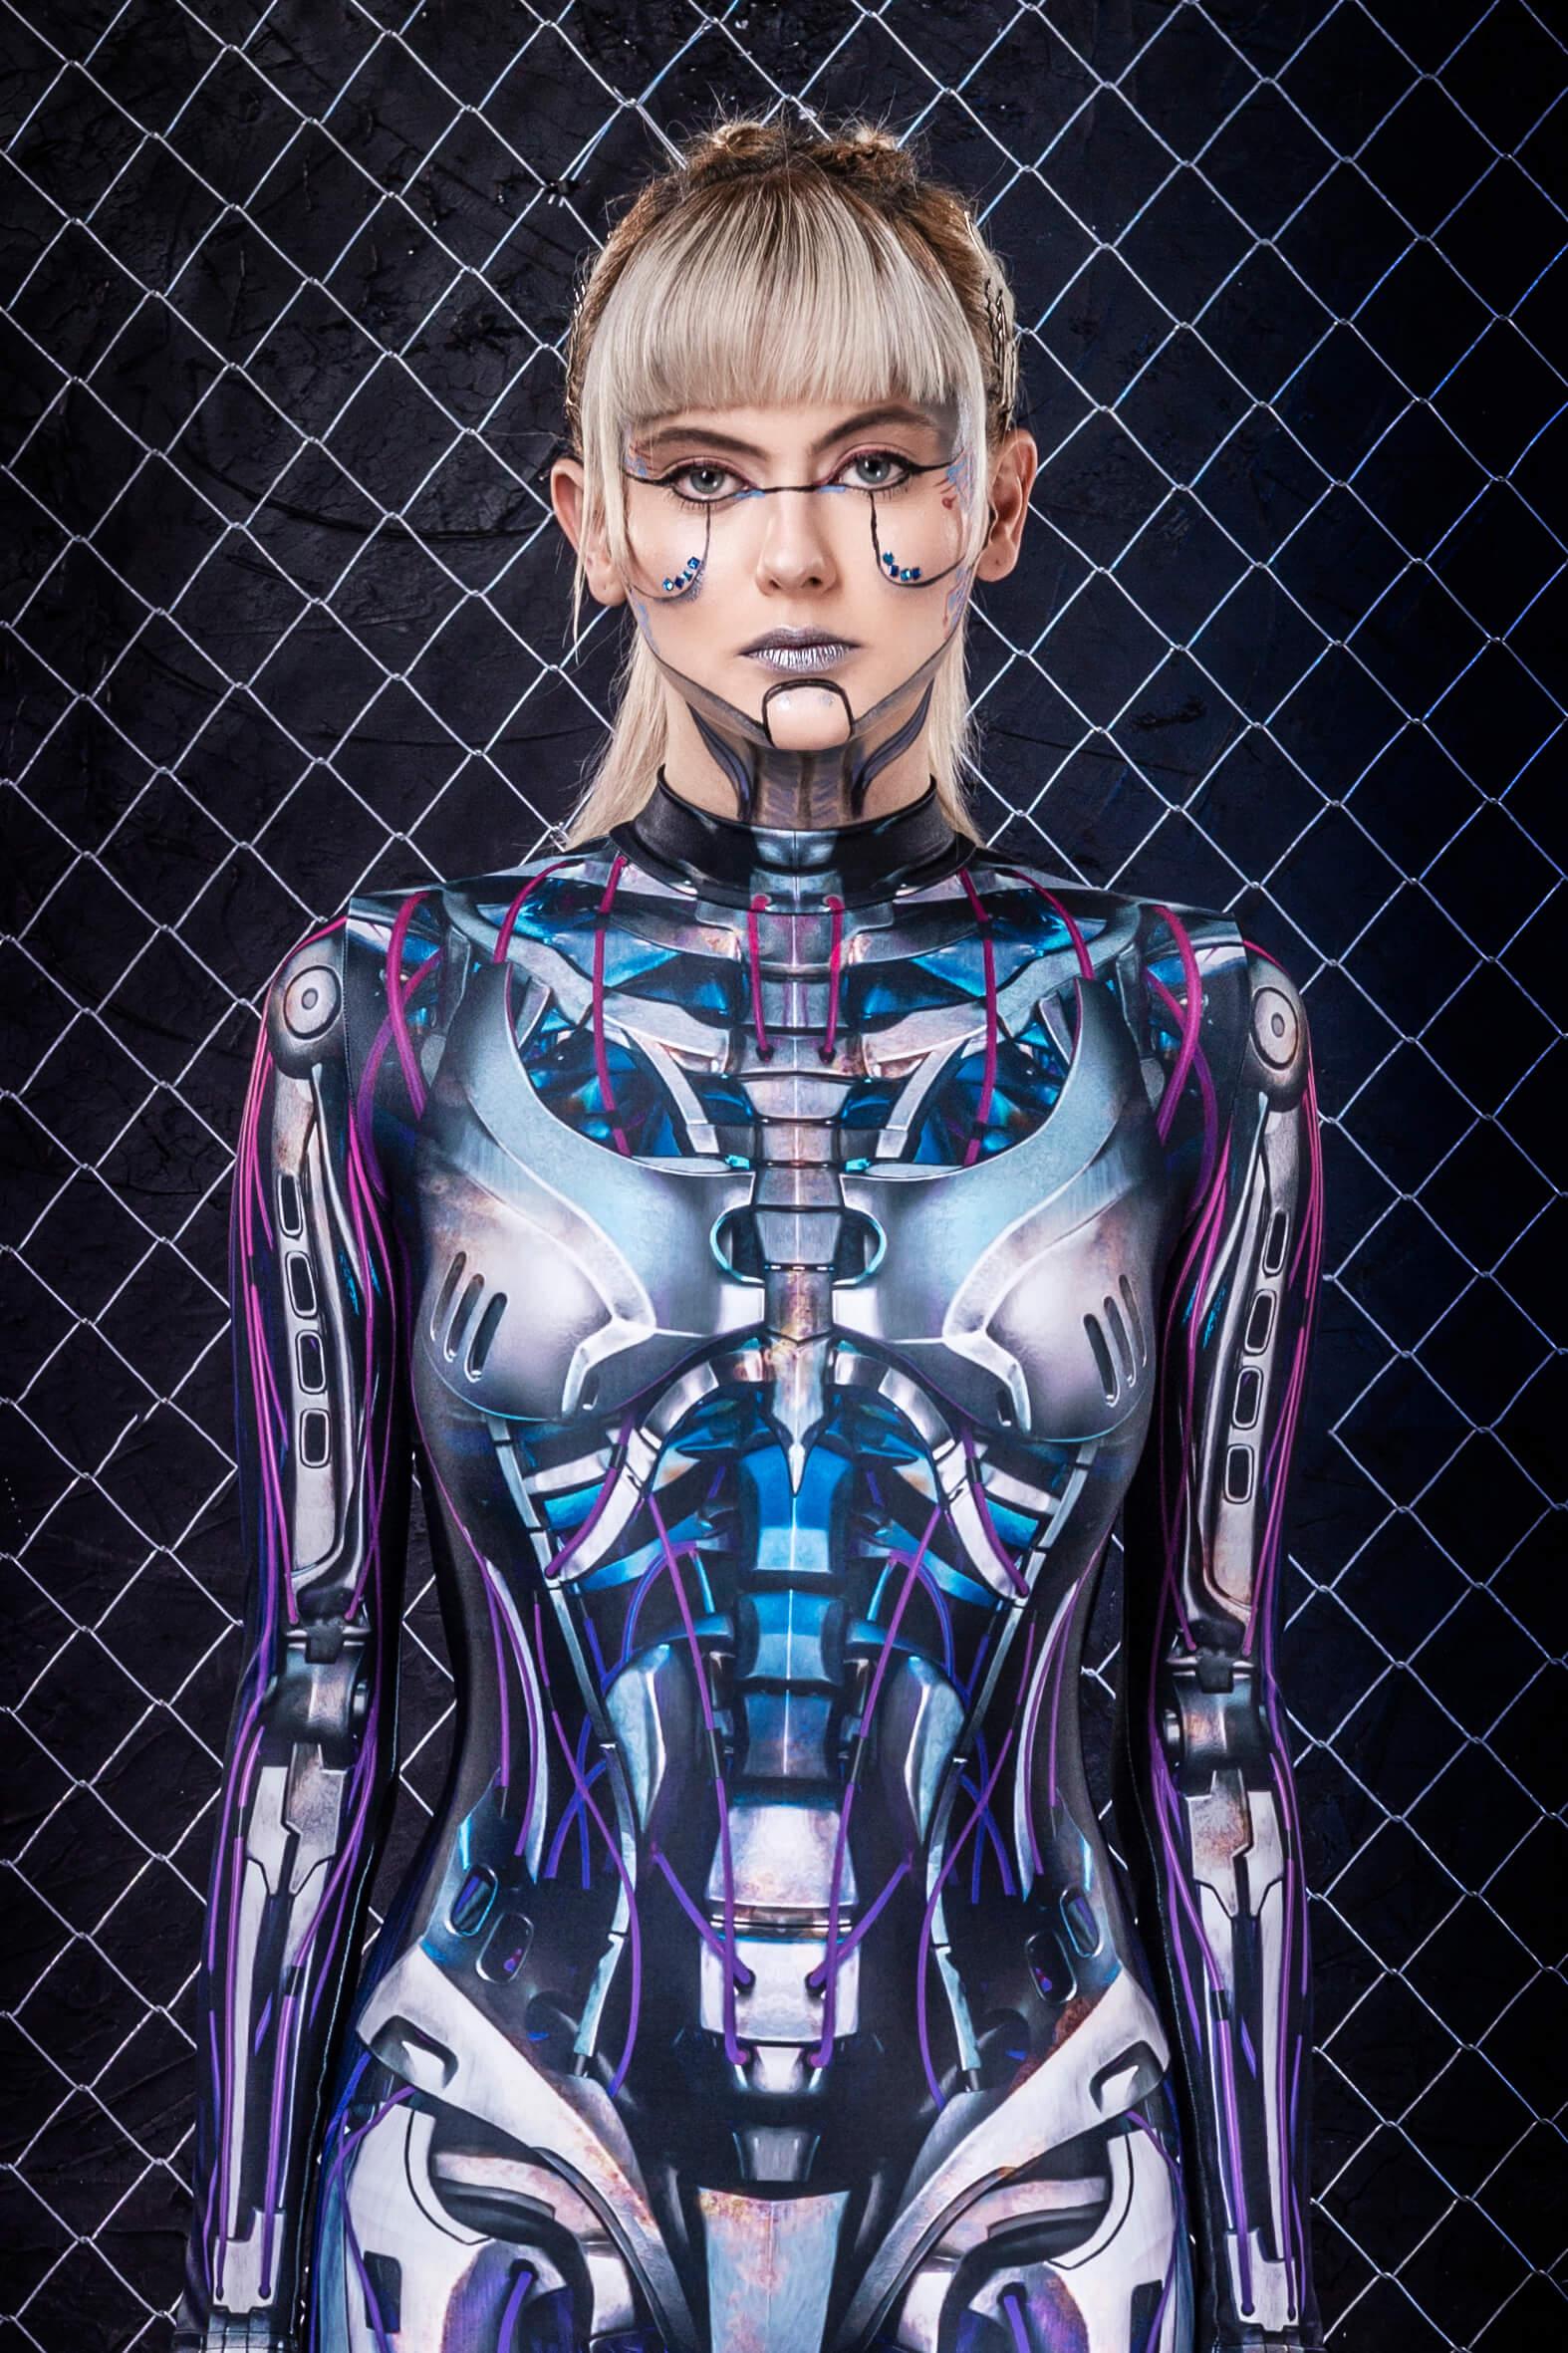 Halloween Costumes Women 2019 - Sexy Robot Woman Halloween Costumes - Blue Glow in the Dark Costume Adult